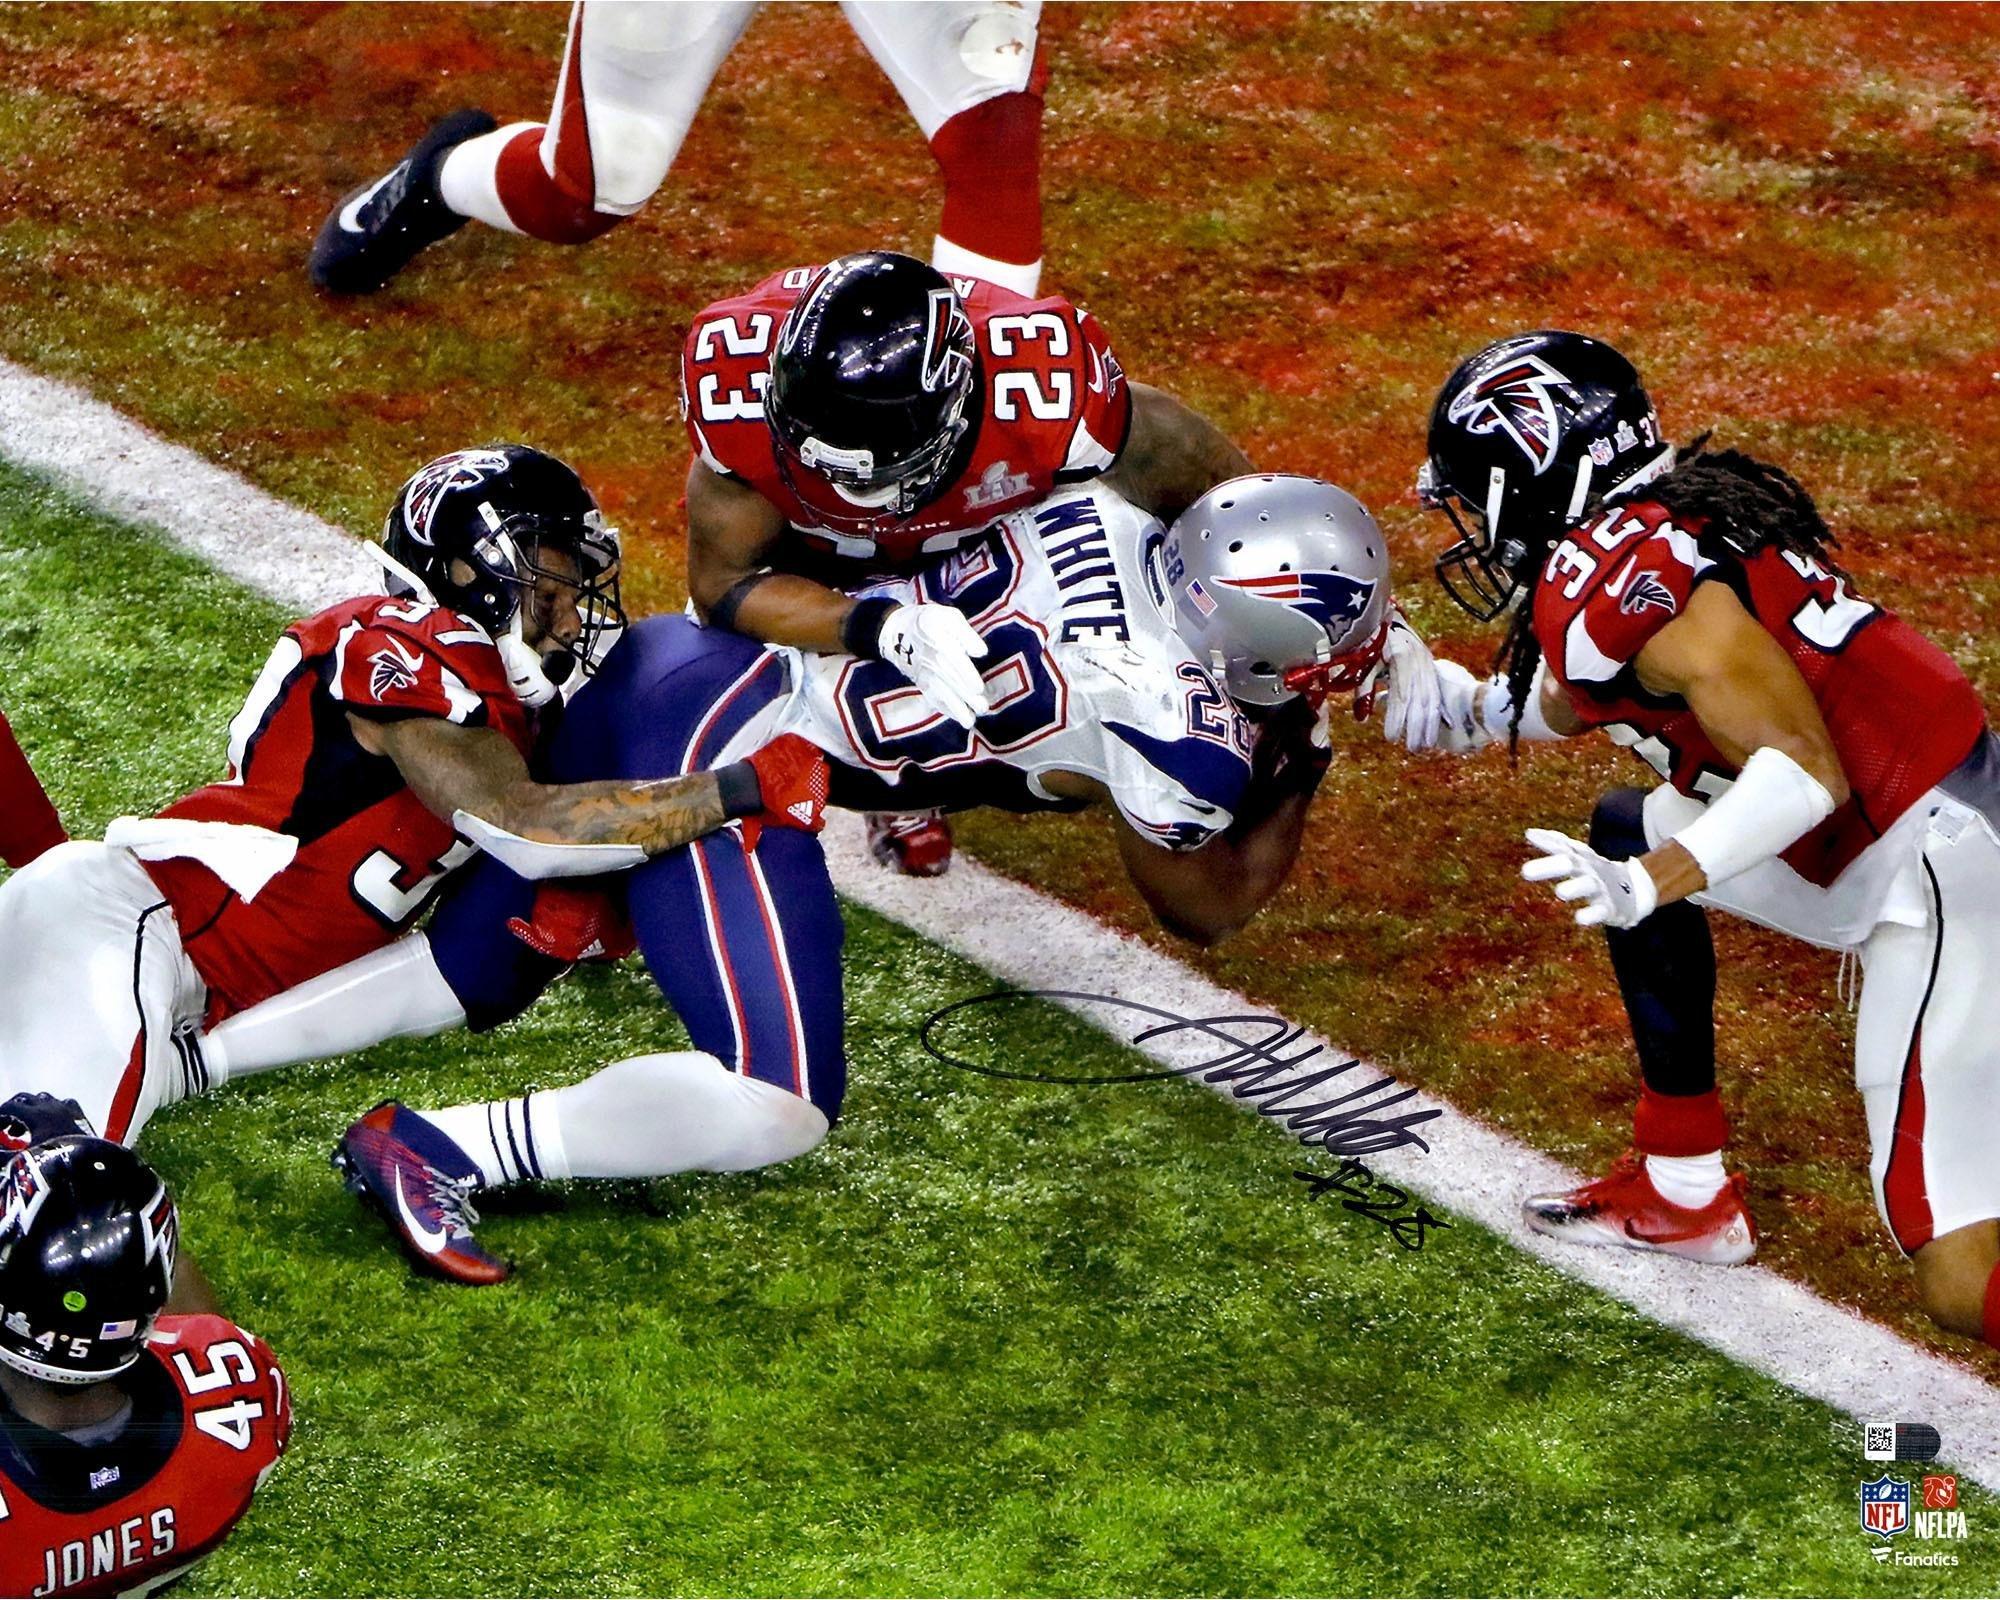 "James White New England Patriots Autographed 16"" x 20"" Super Bowl LI Champions Game Winning Touchdown Photograph Fanatics Authentic Certified"